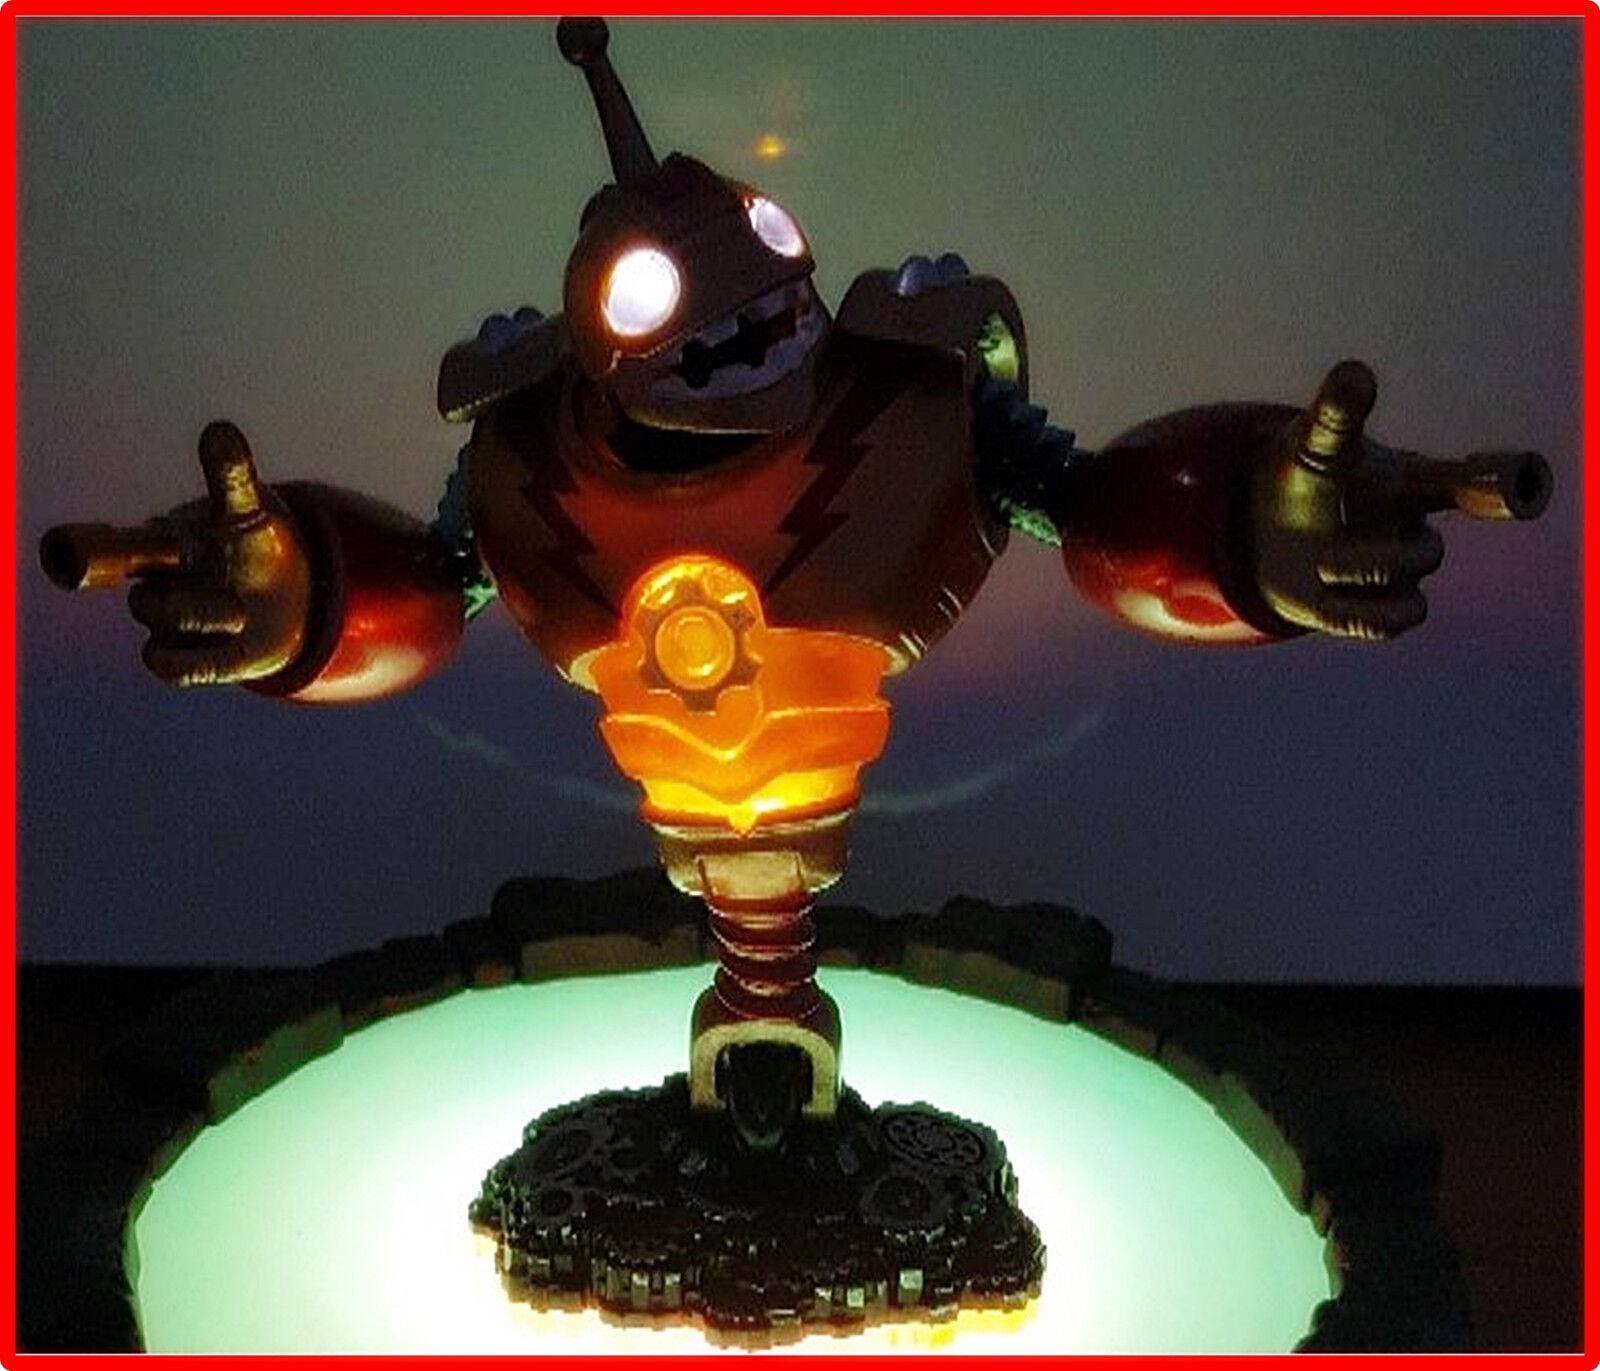 Skylanders Giants Figurines Figurines Figurines Séléction pour: Ps3, Xbox, Wii, 3ds, U, Elite, 1527c8